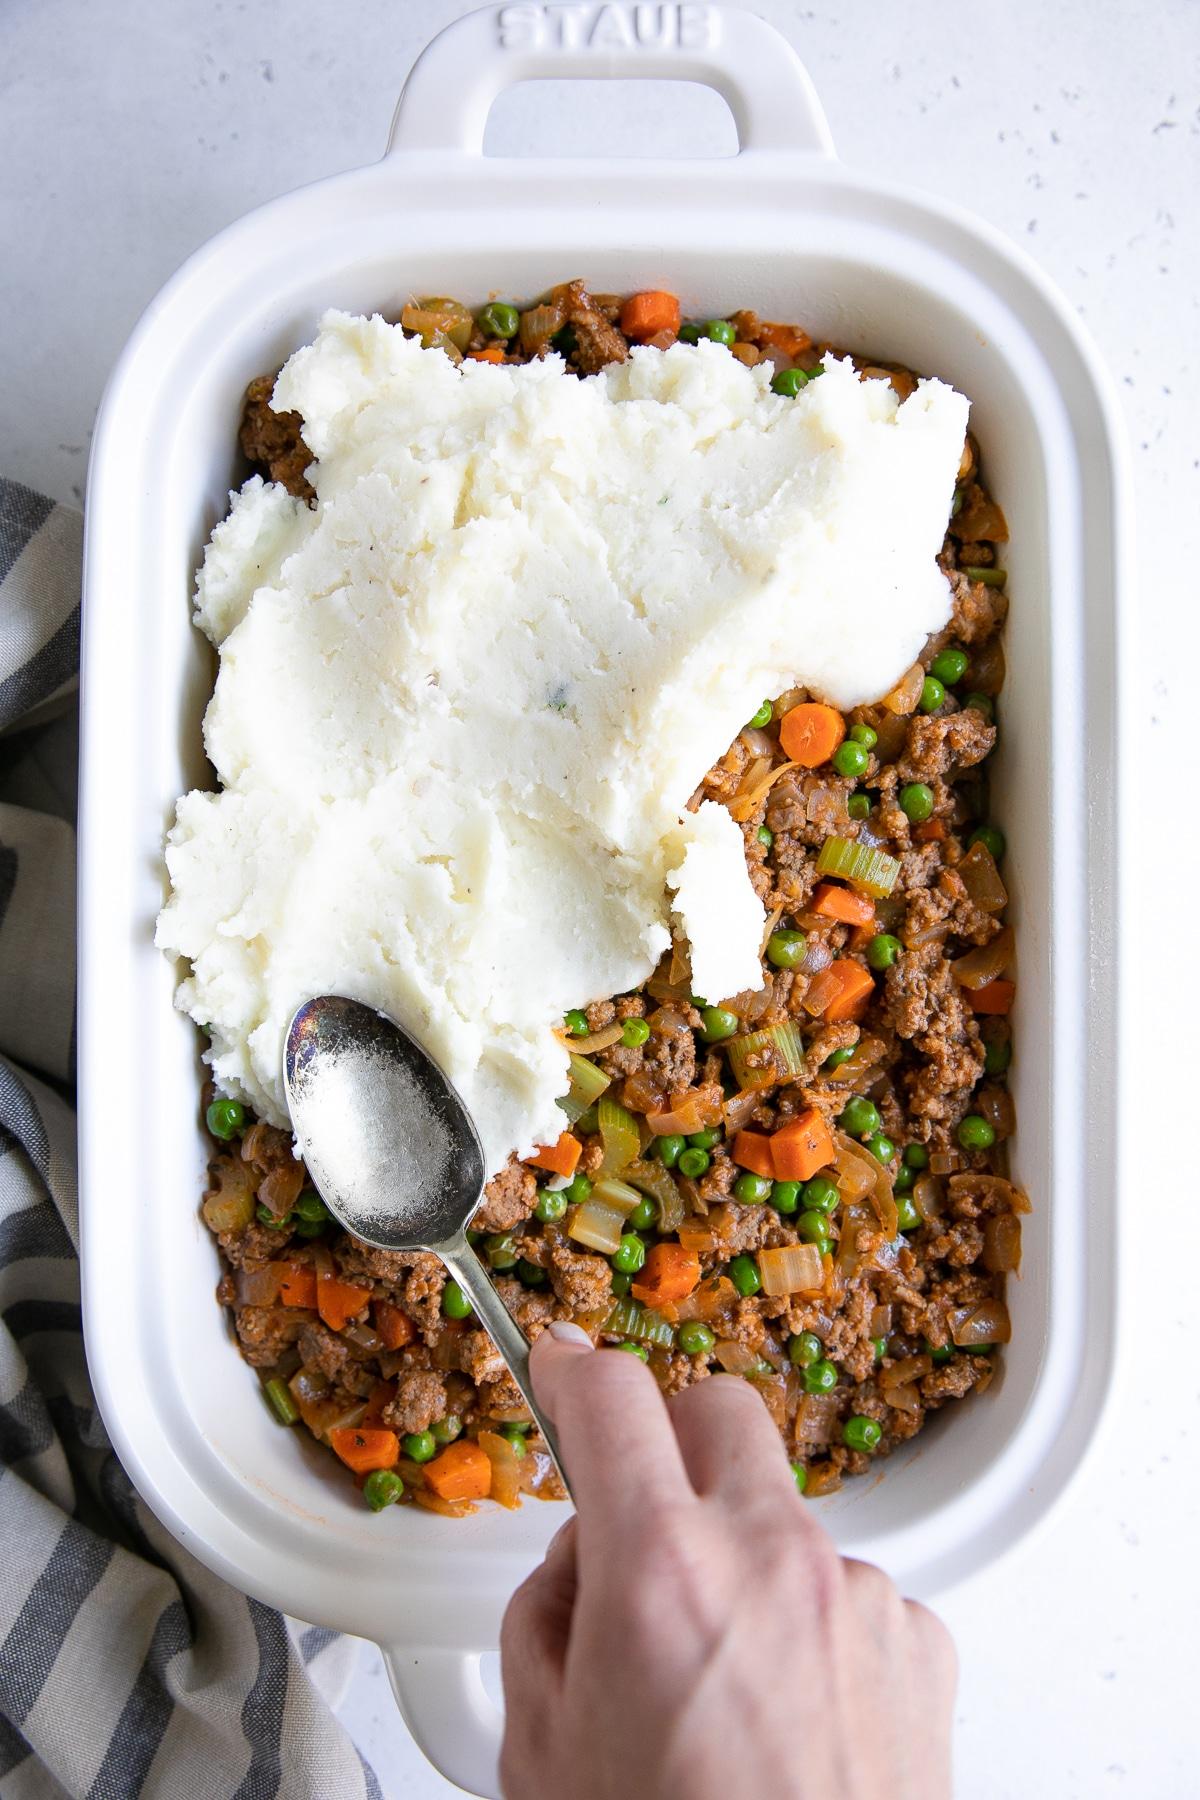 Assembling Shepherd's Pie in a large white casserole dish.